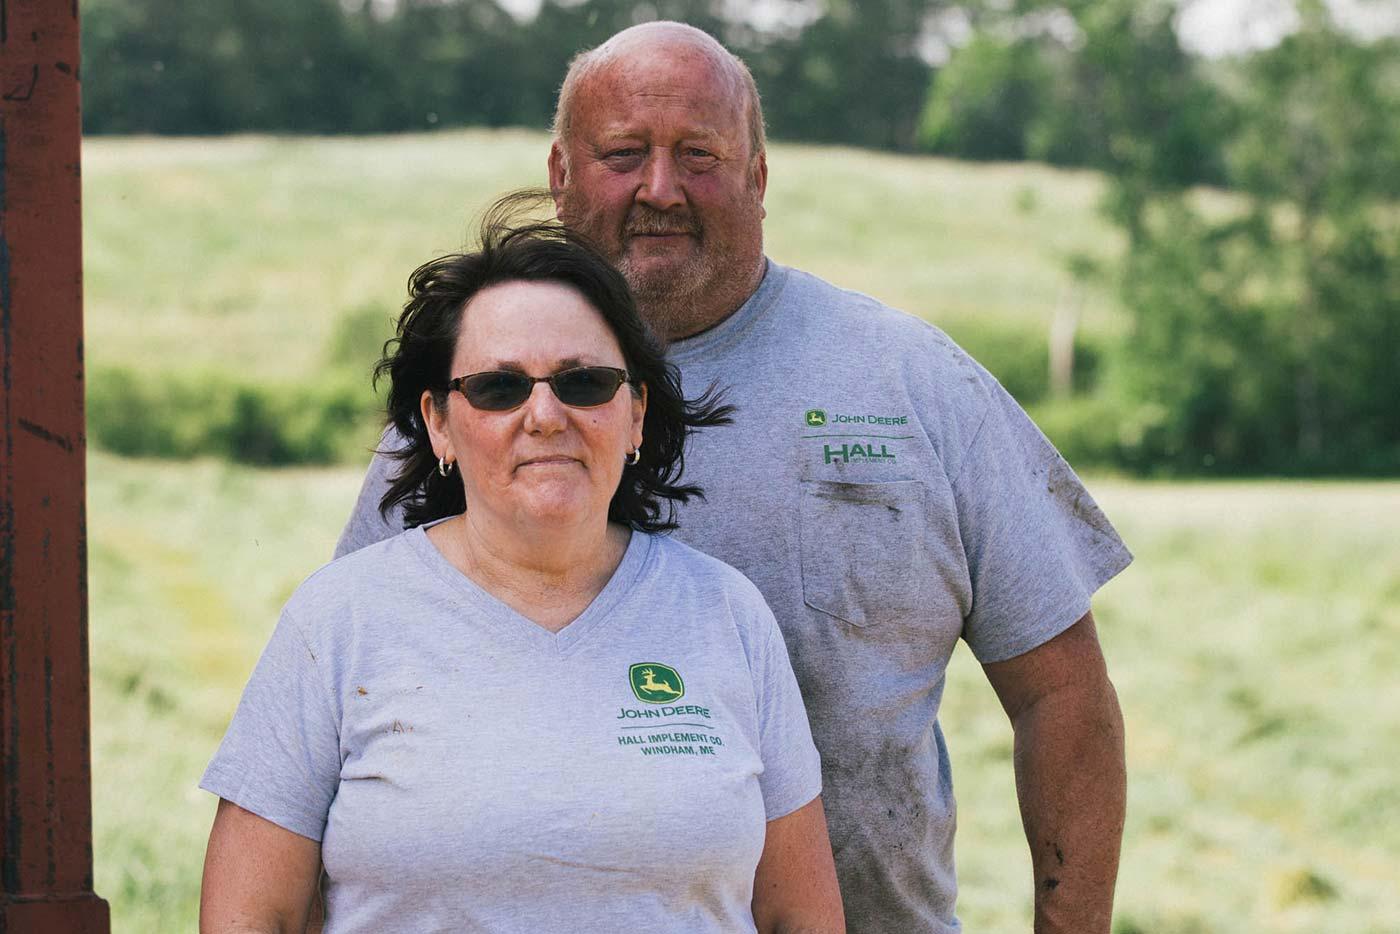 https://www.oakhurstdairy.com/wp-content/uploads/2021/09/farmer-imgs-halledge1-150x150.jpg